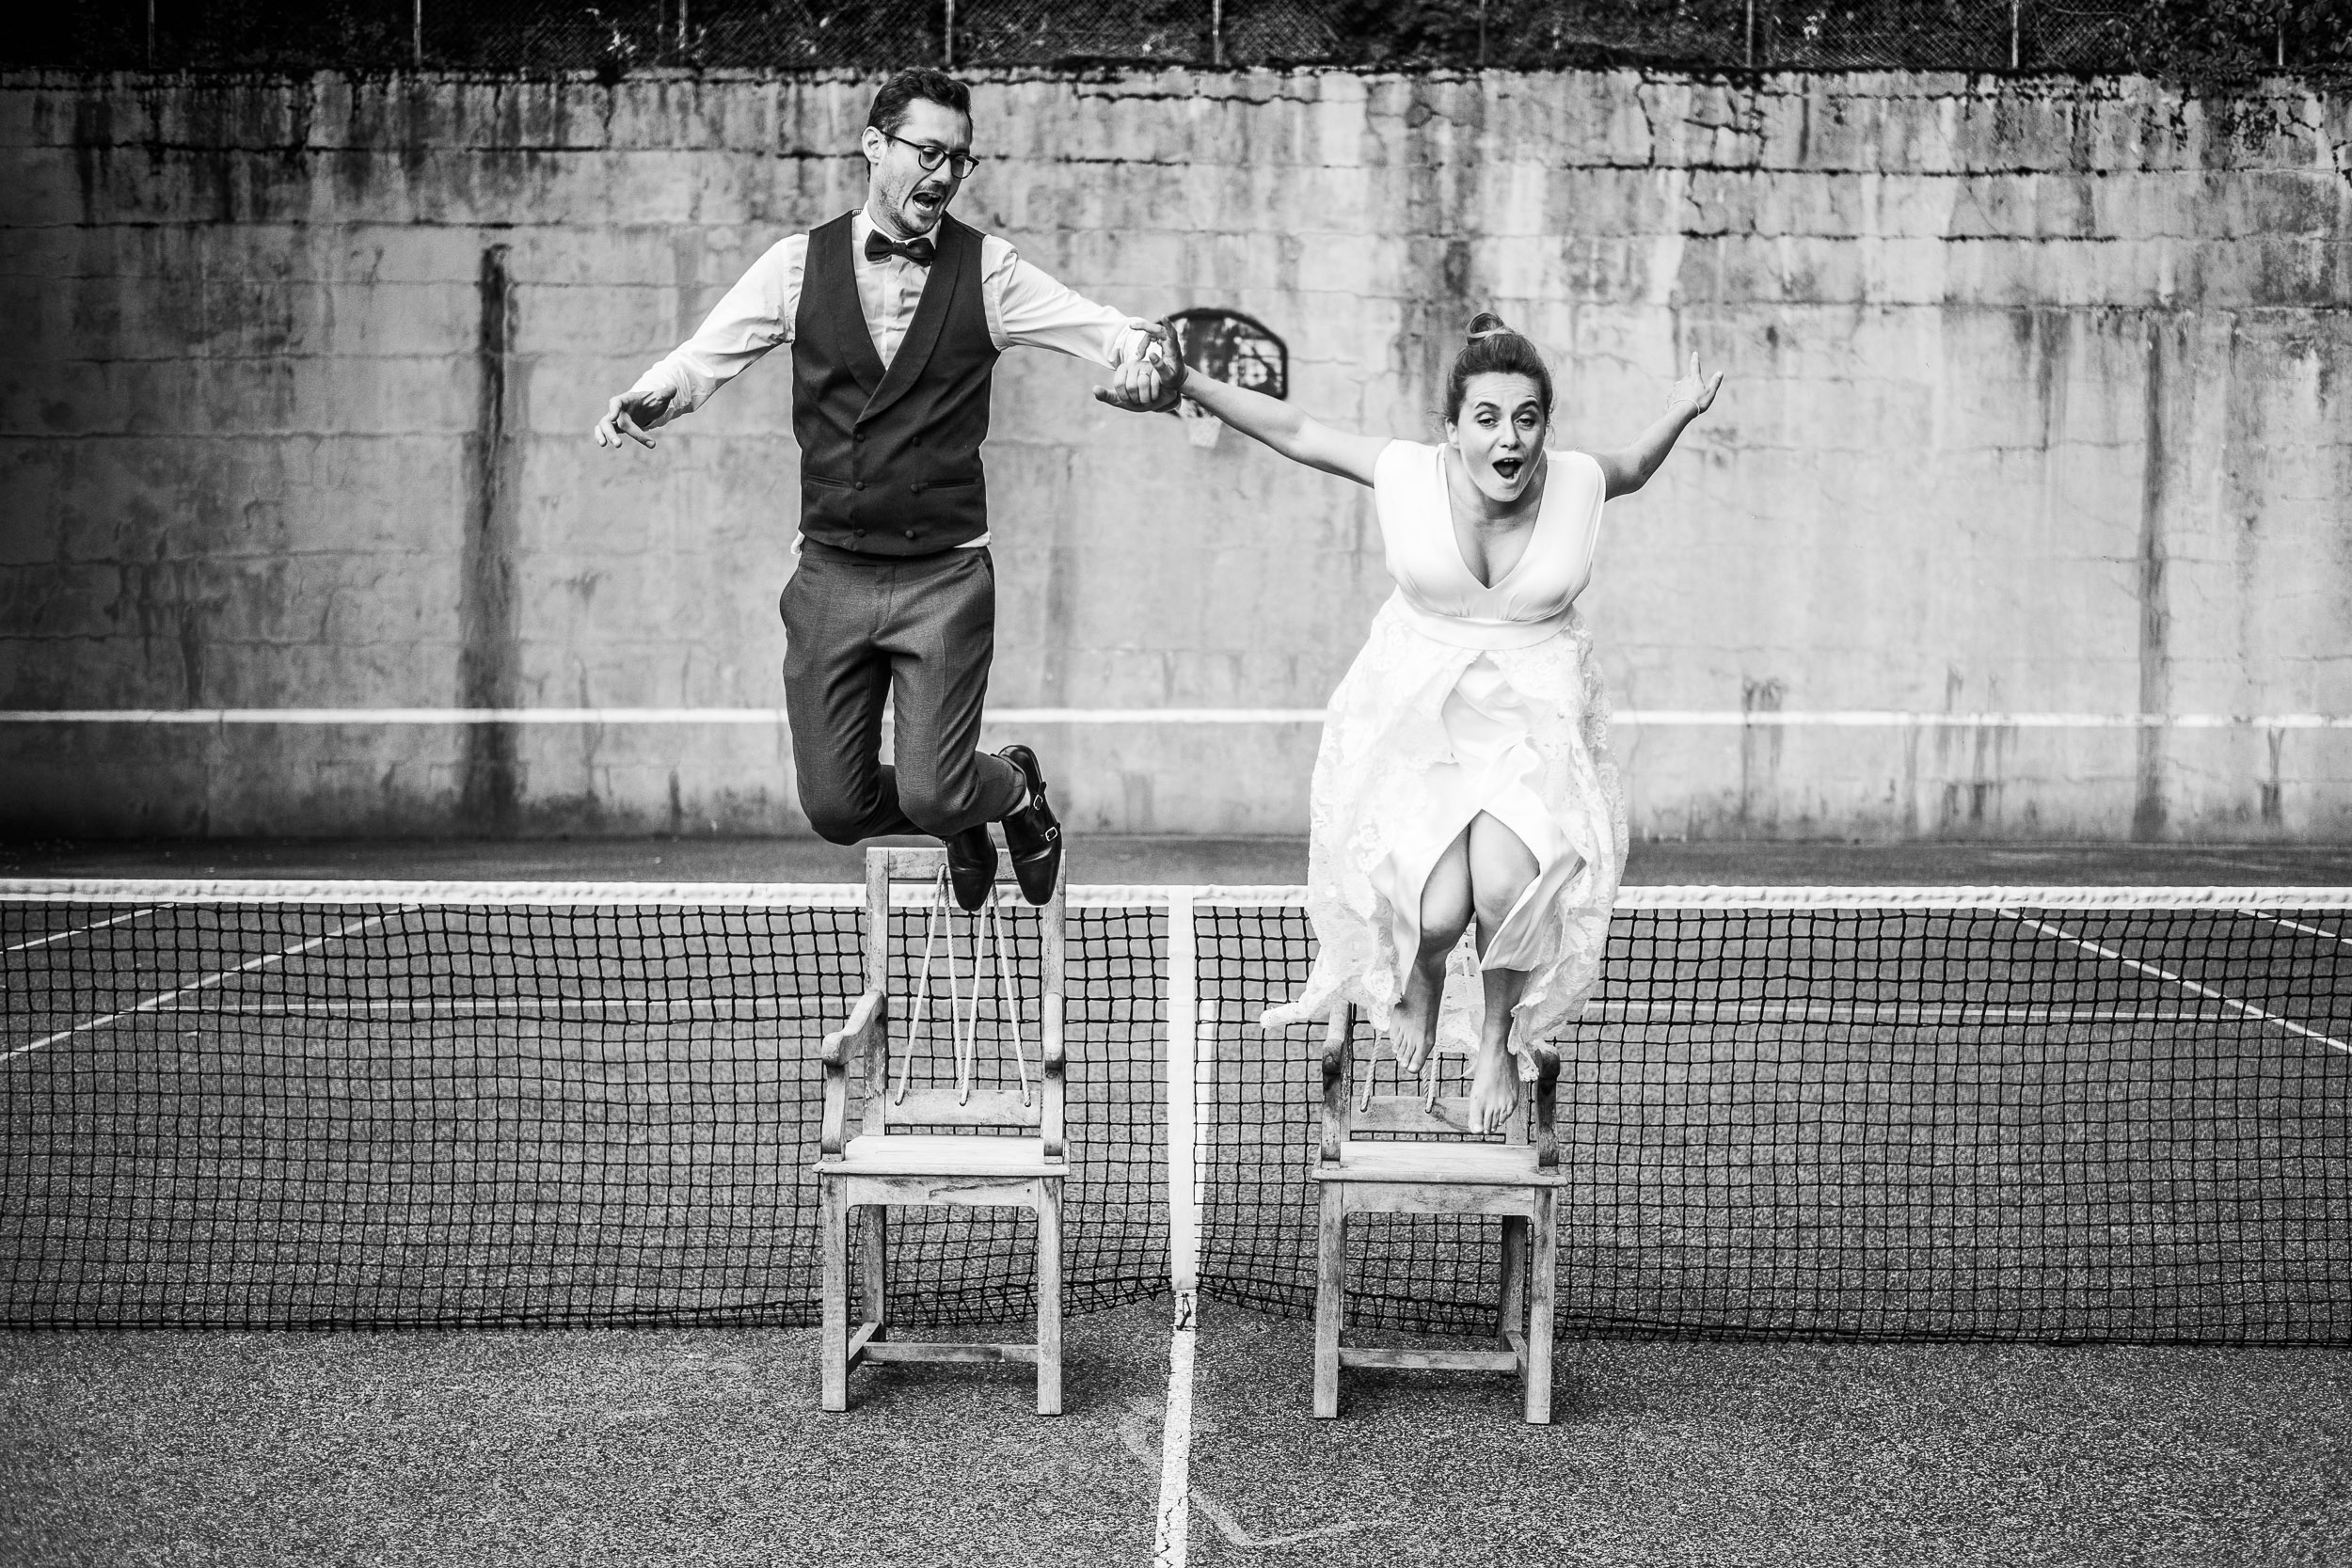 gerald-mattel-photographe-mariage-annecy-verrier-menthon-13.jpg